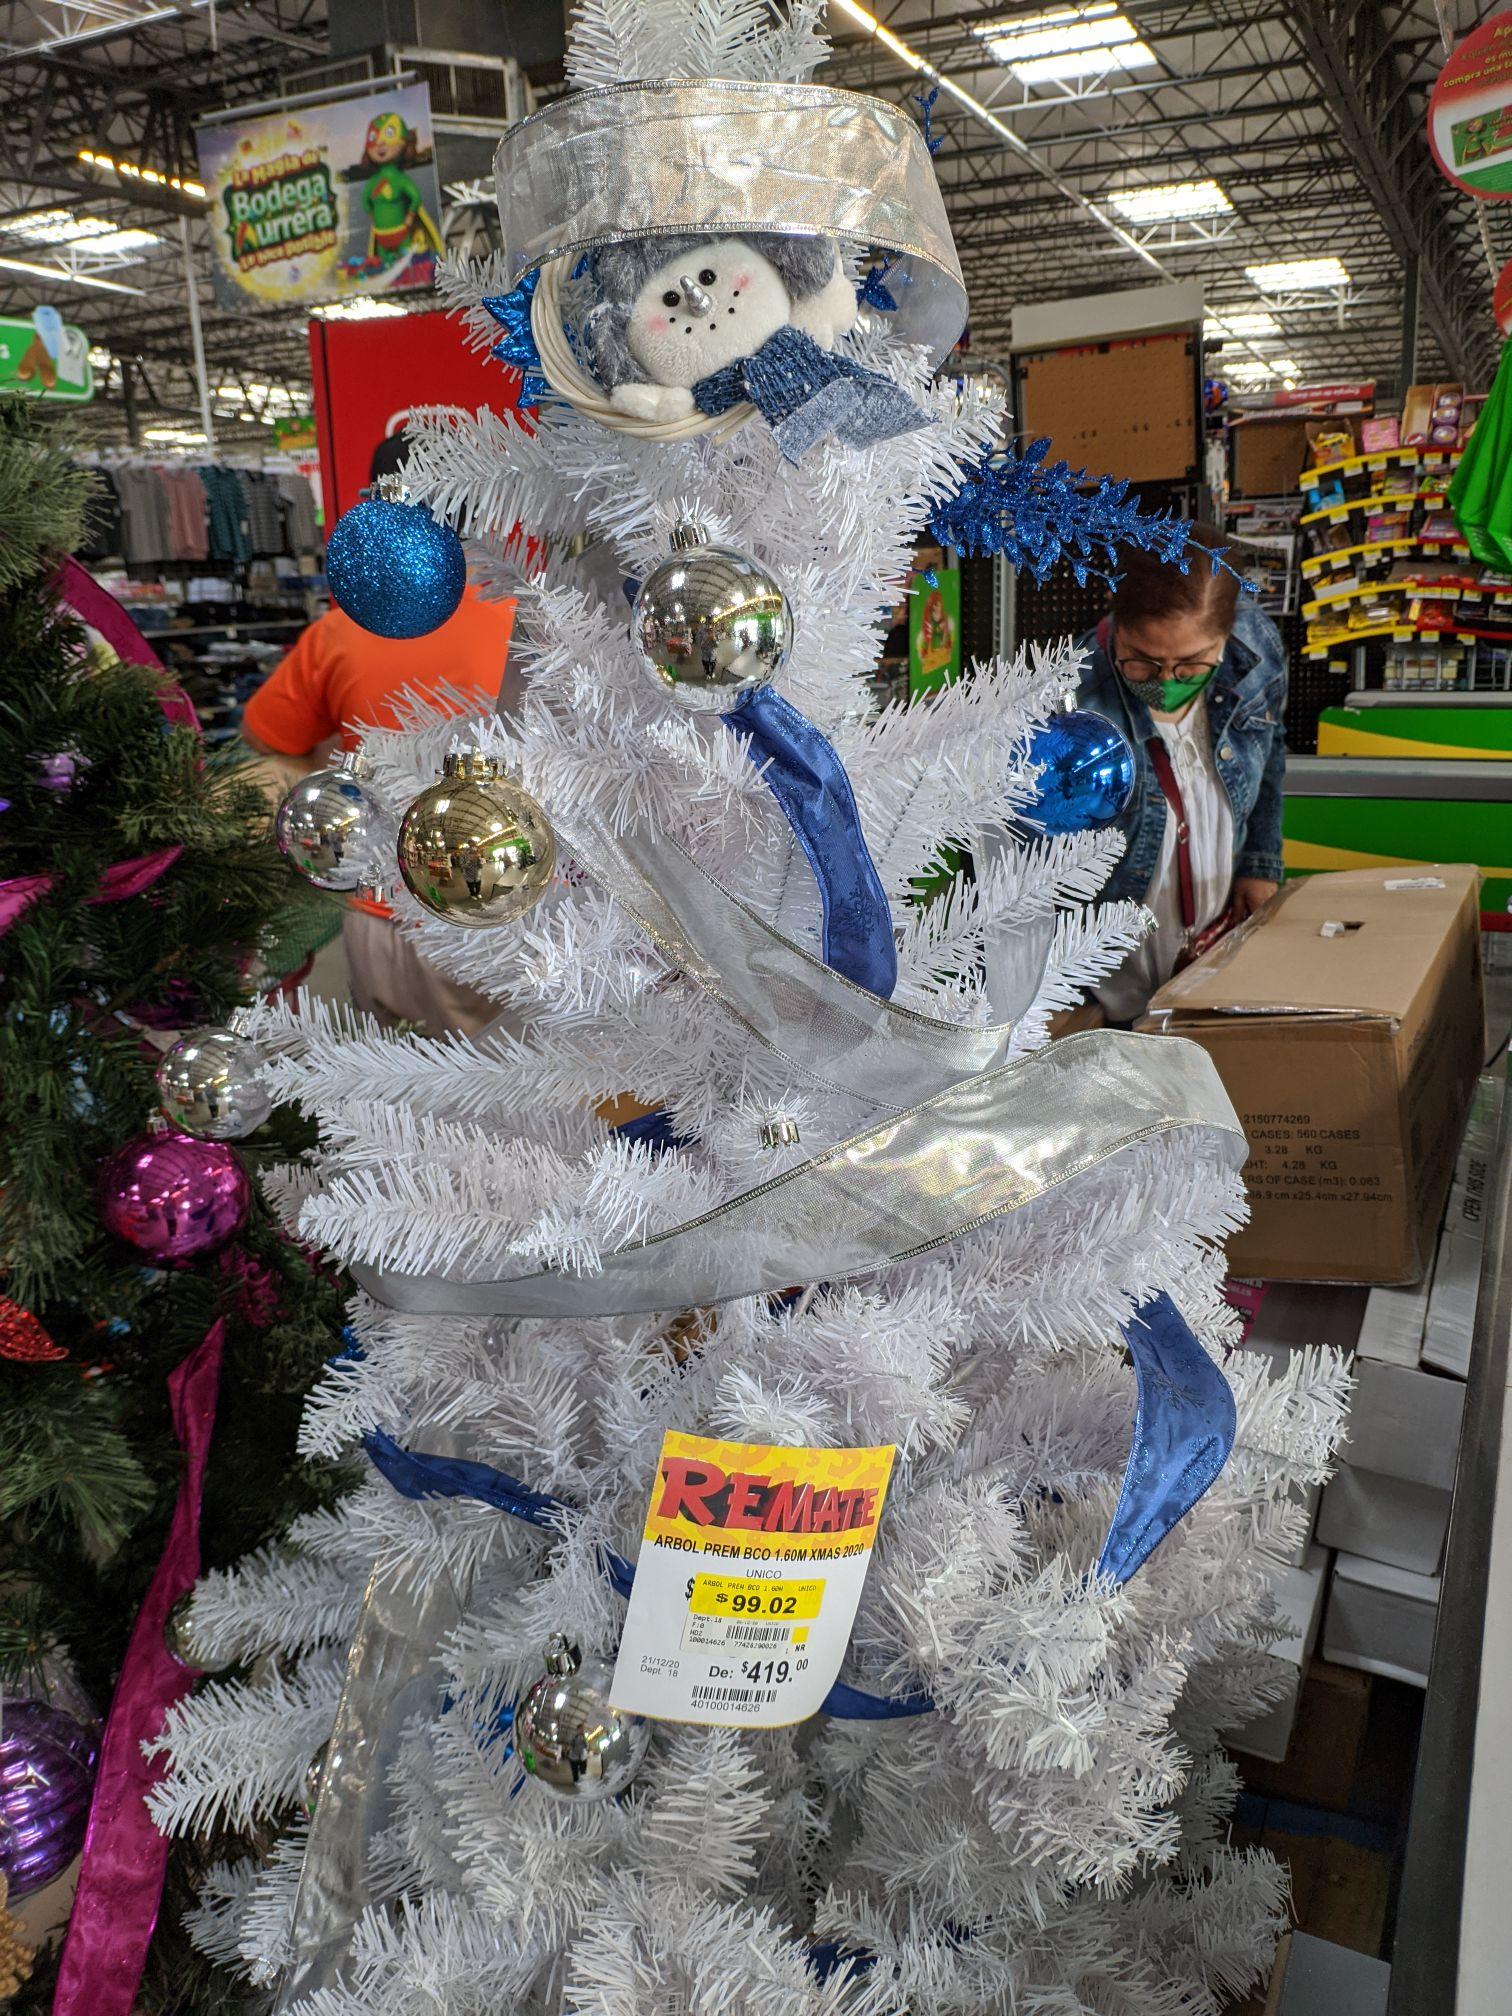 Bodega Aurrerá: Árboles de navidad 75%